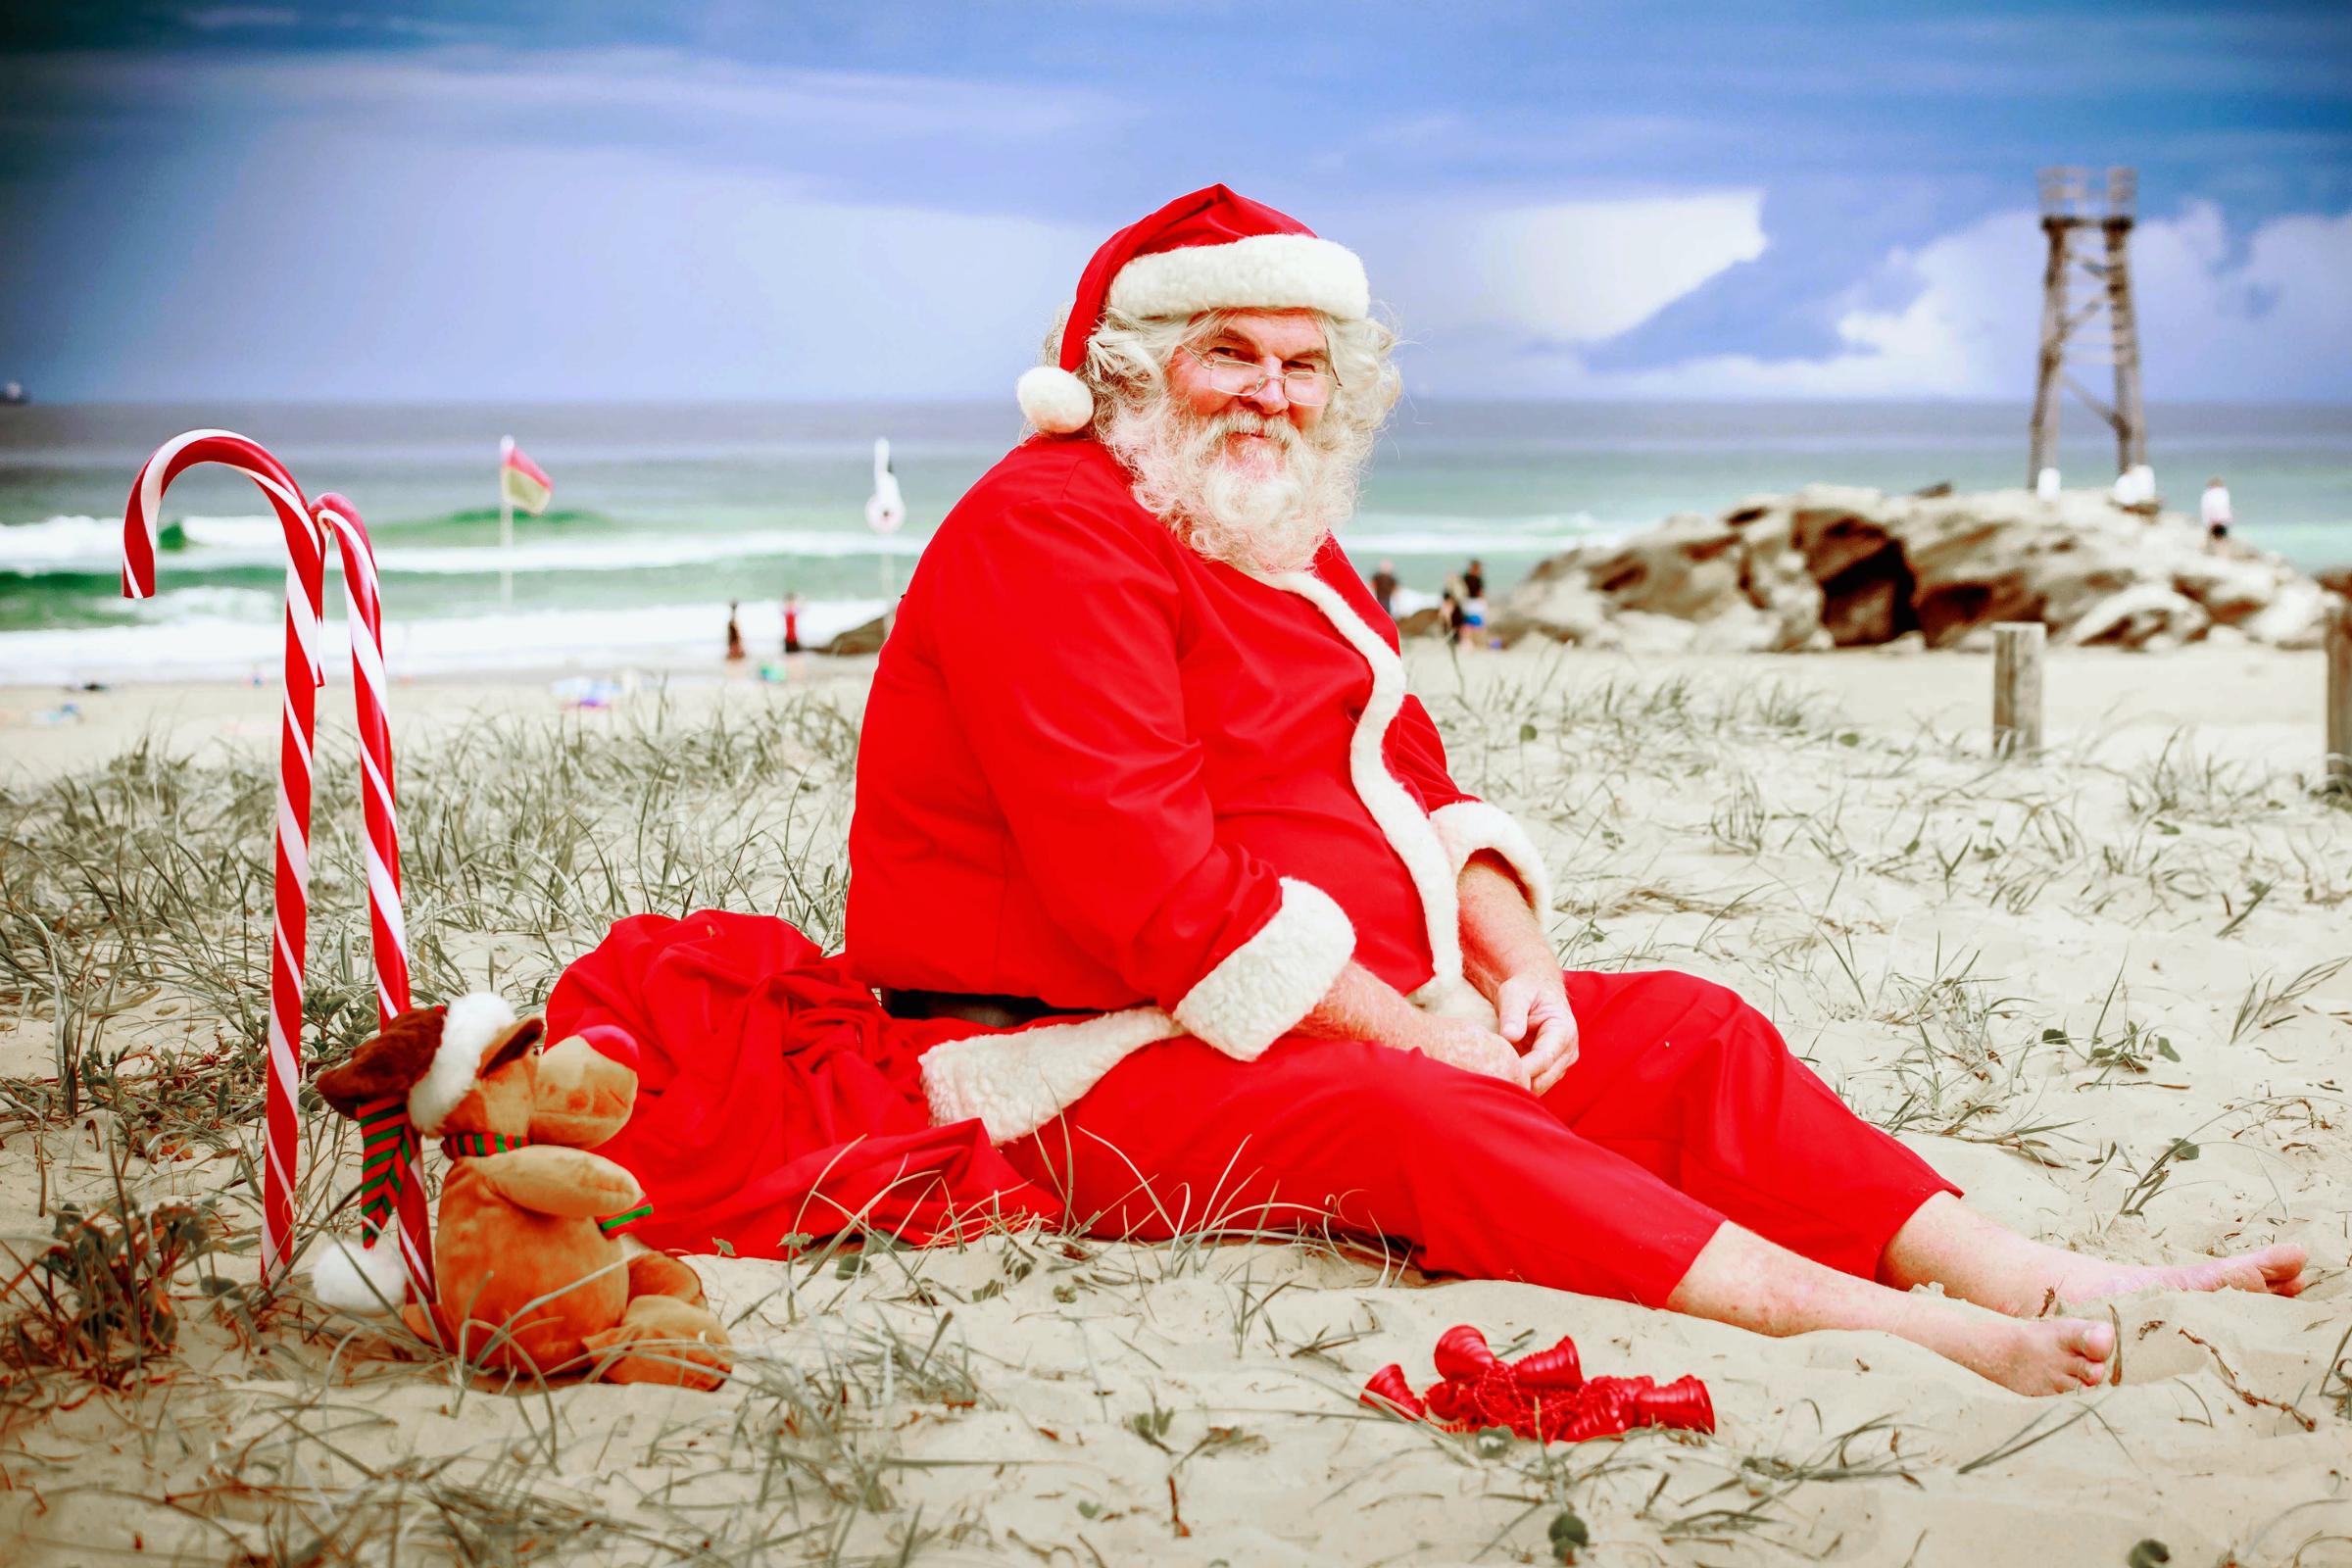 Fêter Noël en Australie